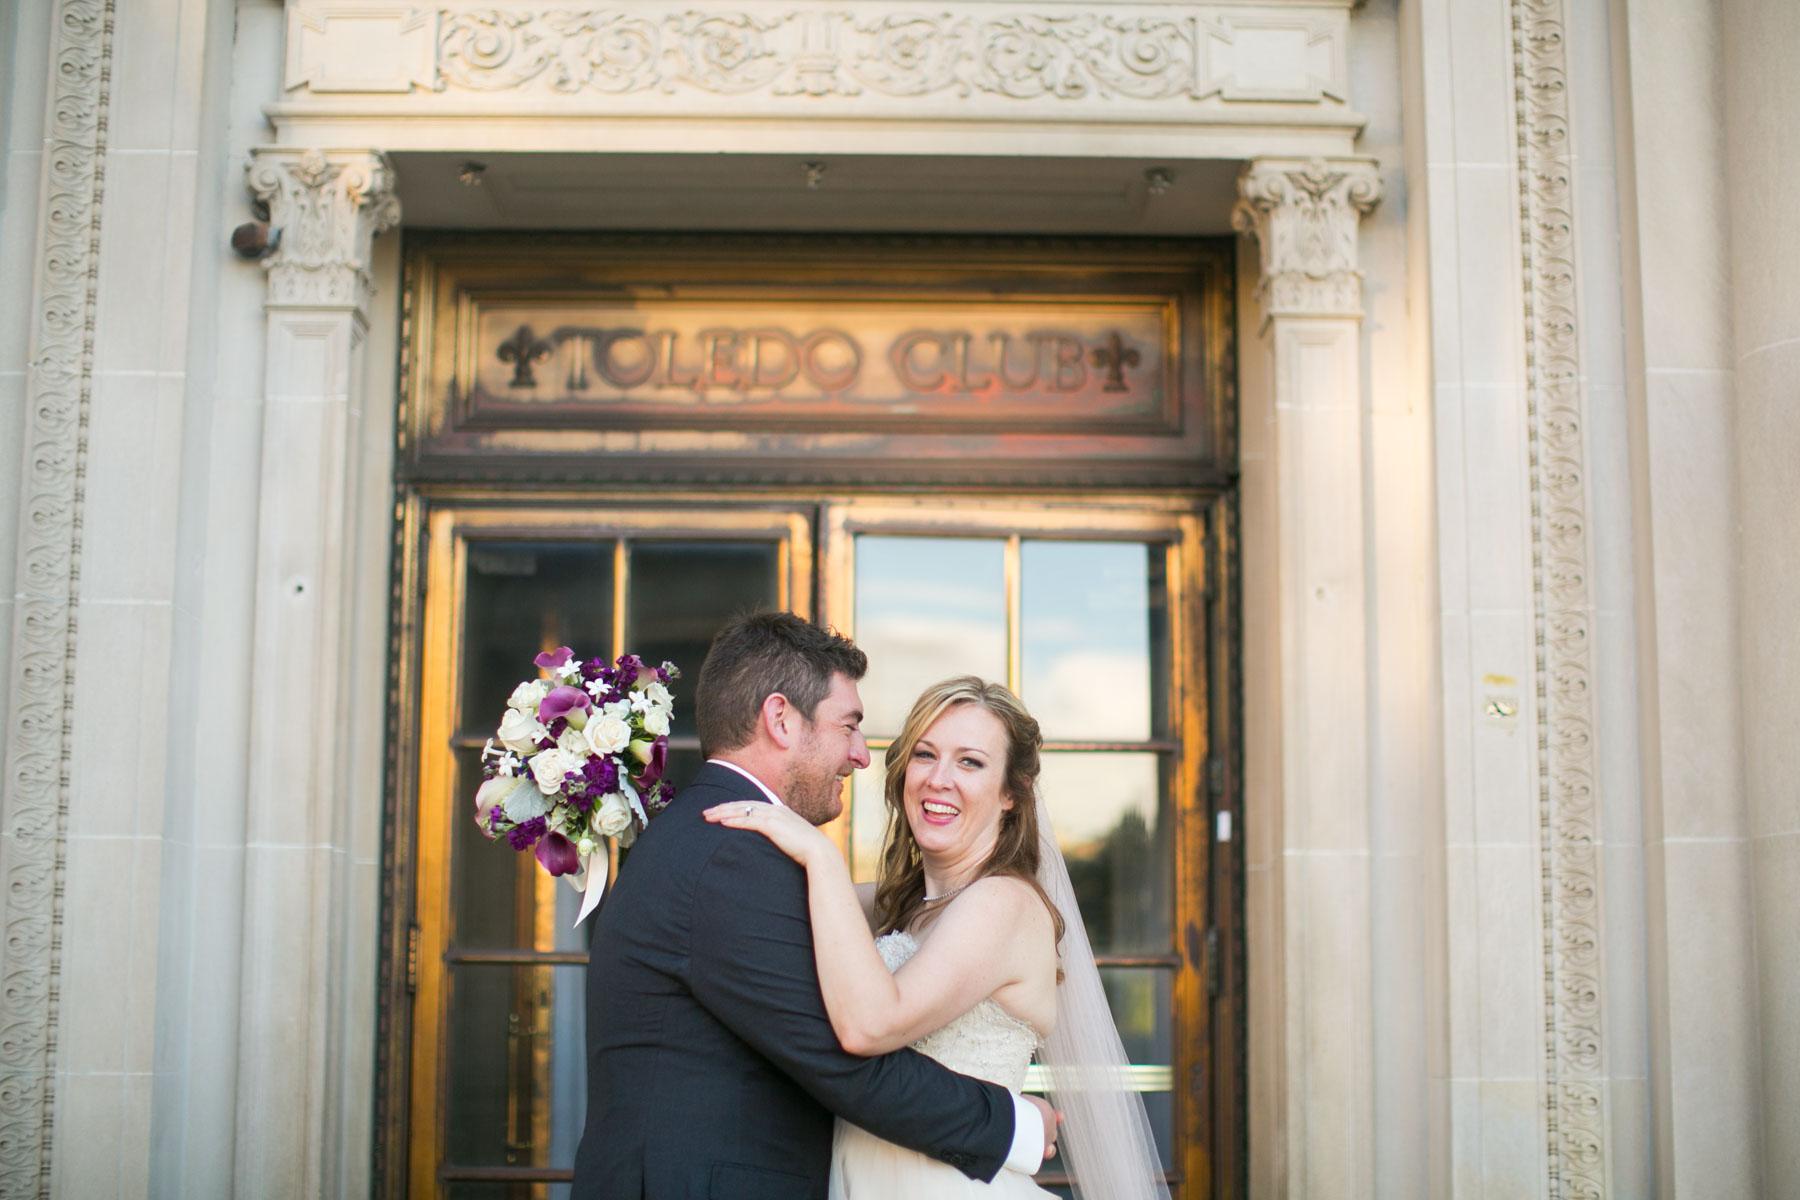 toledo-club-wedding-photos (81 of 101).jpg